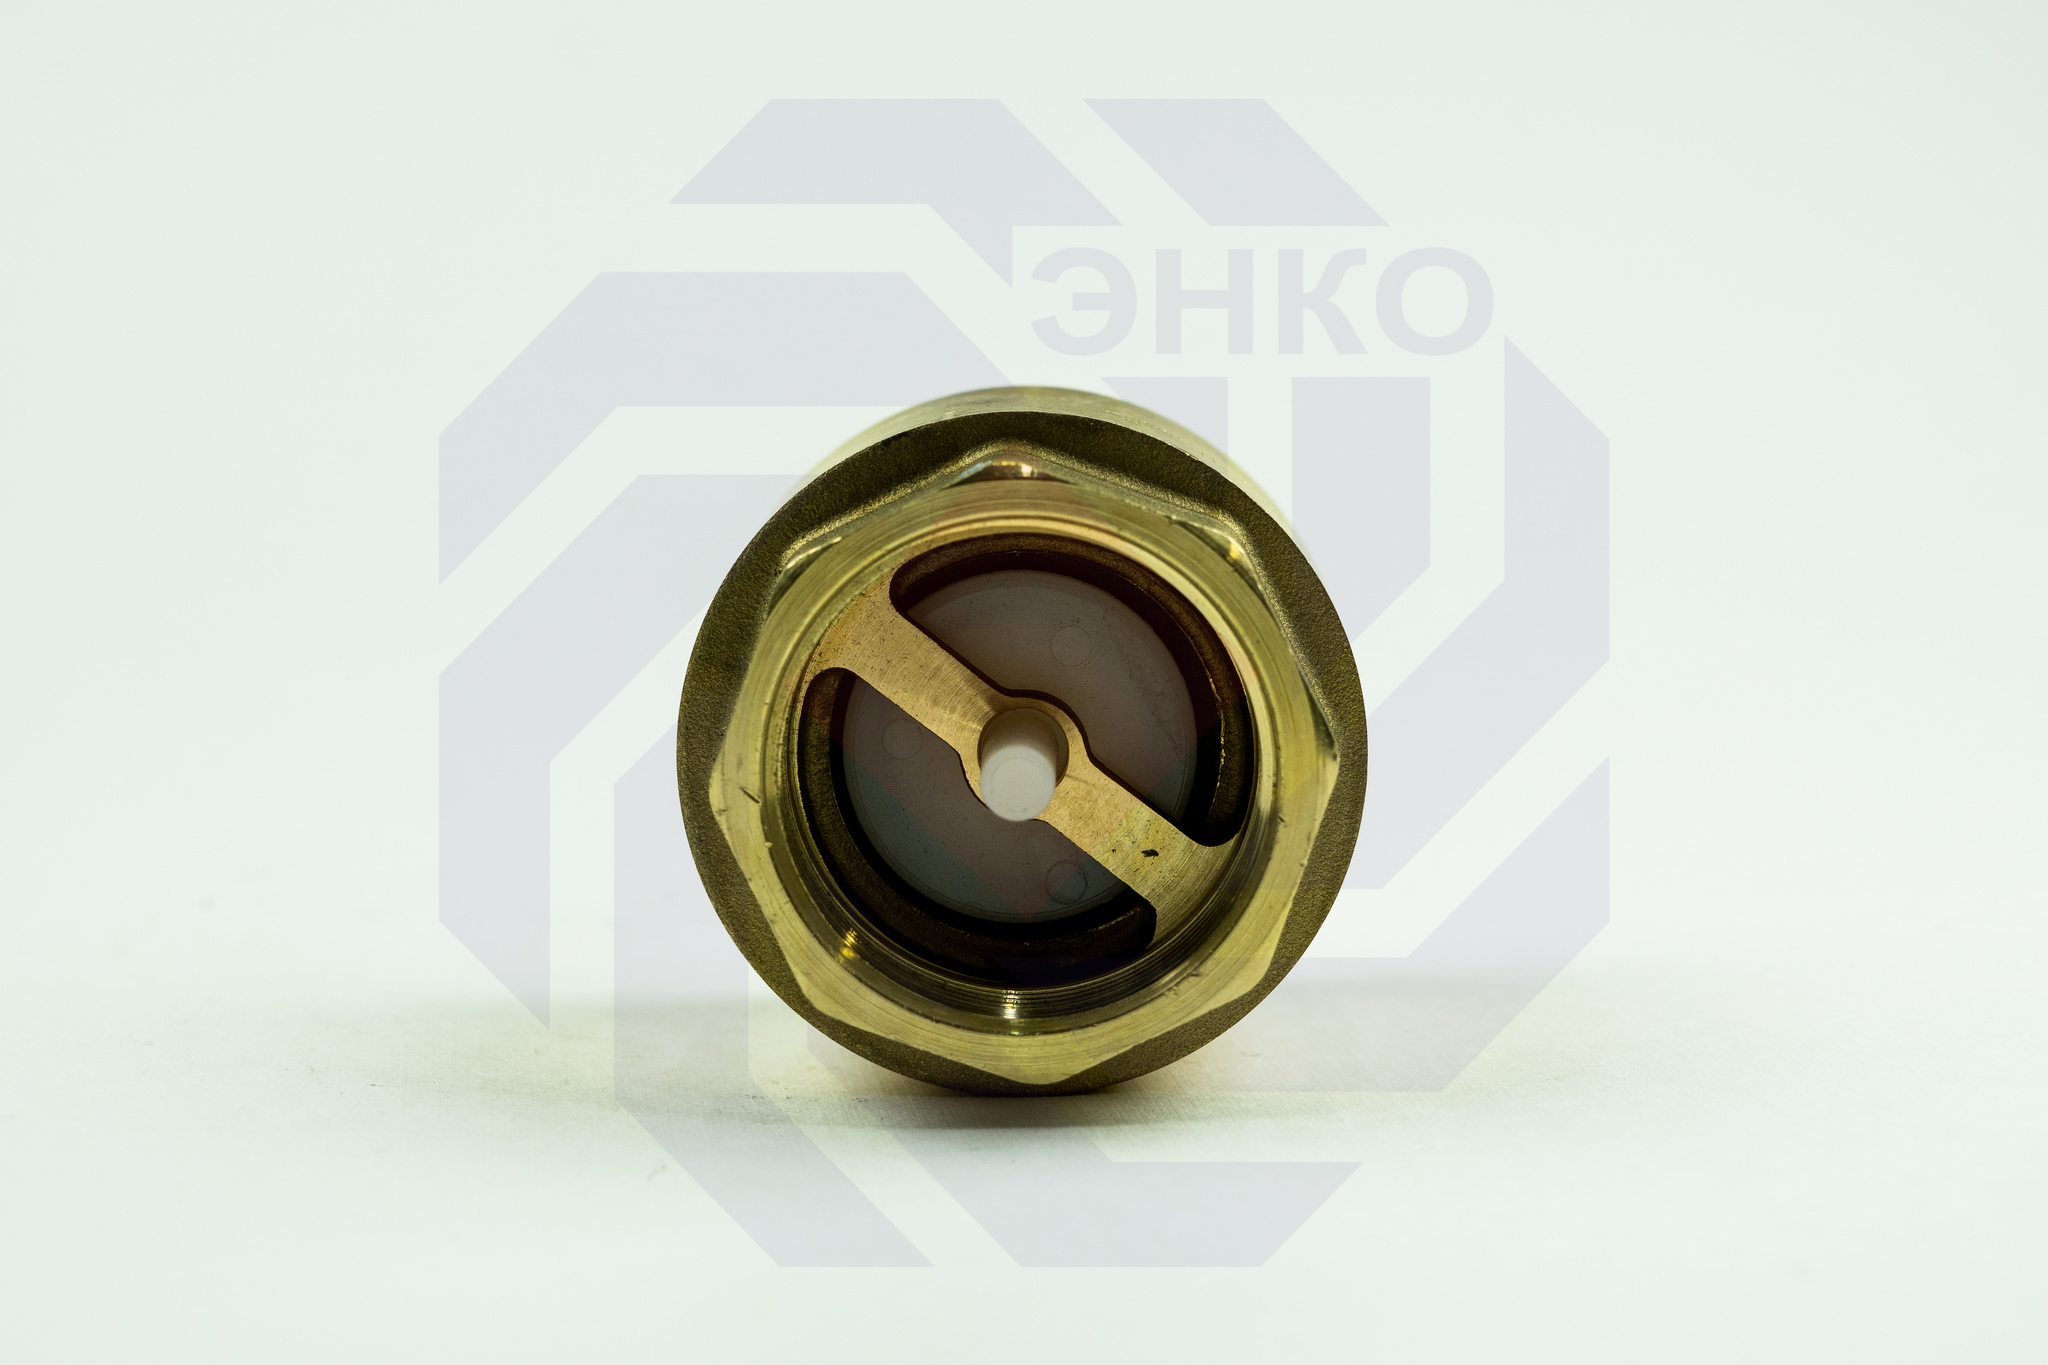 Клапан обратный ВР/ВР BUGATTI EURO 1000 1½